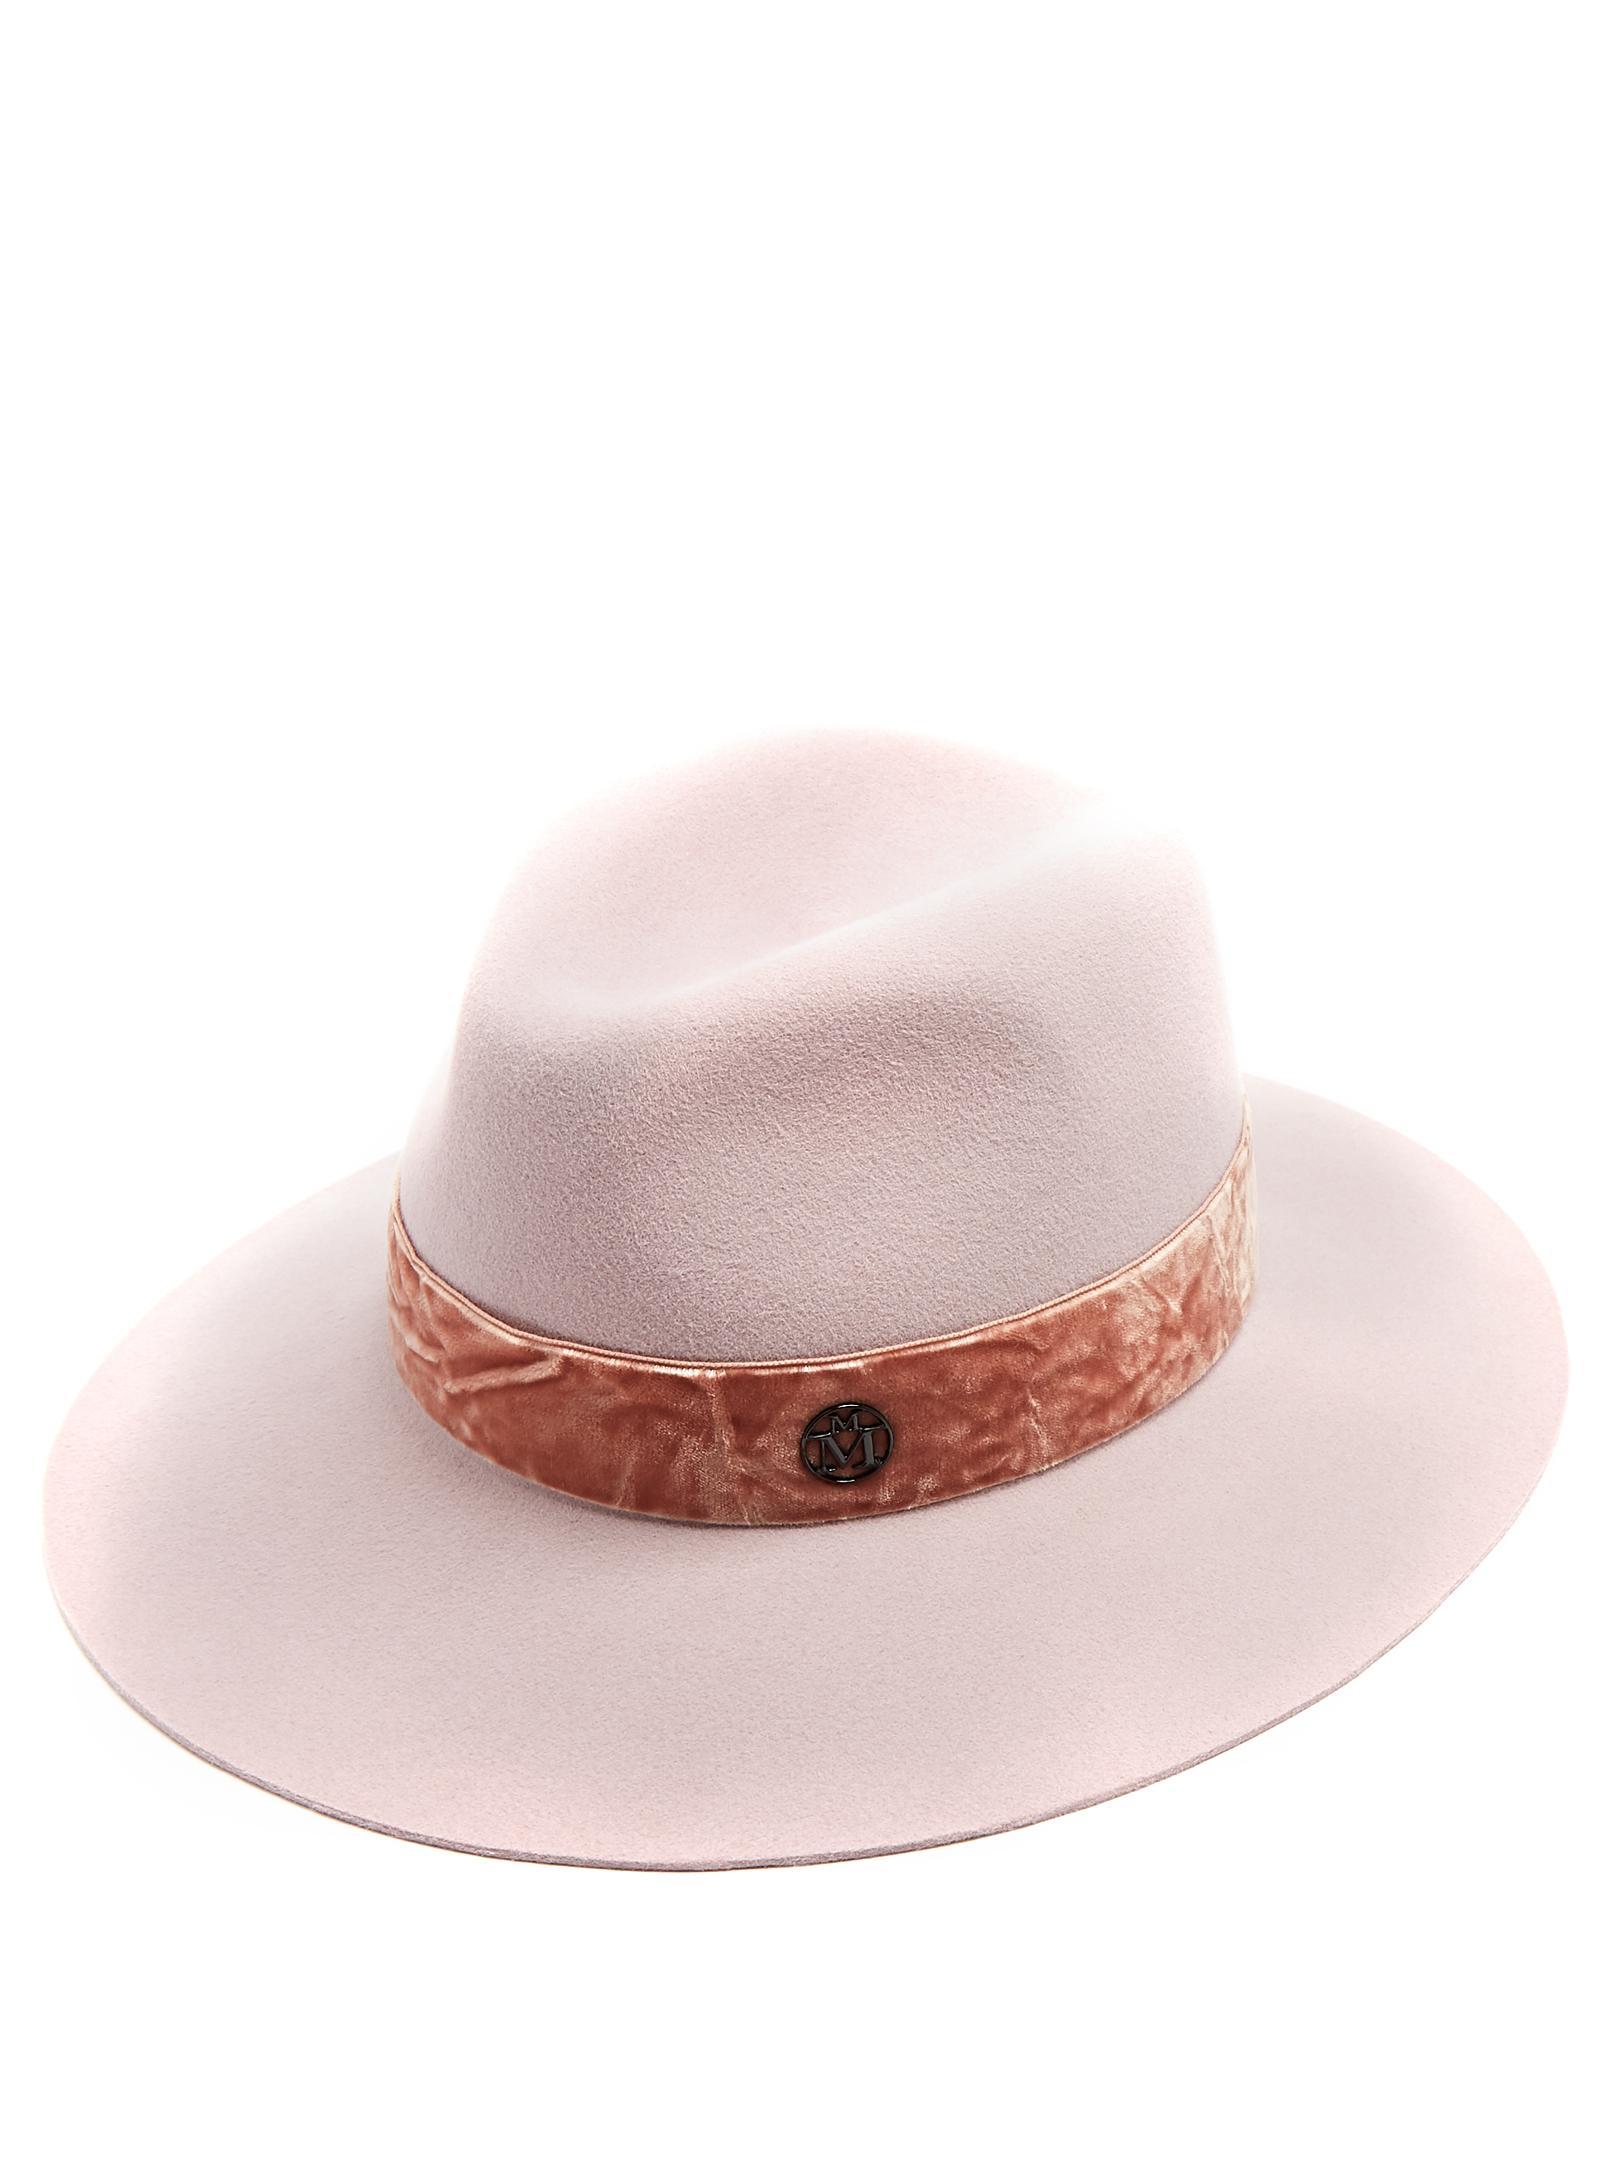 7cad42778a6cf2 Lyst - Maison Michel Henrietta Rabbit-fur Felt Hat in Pink